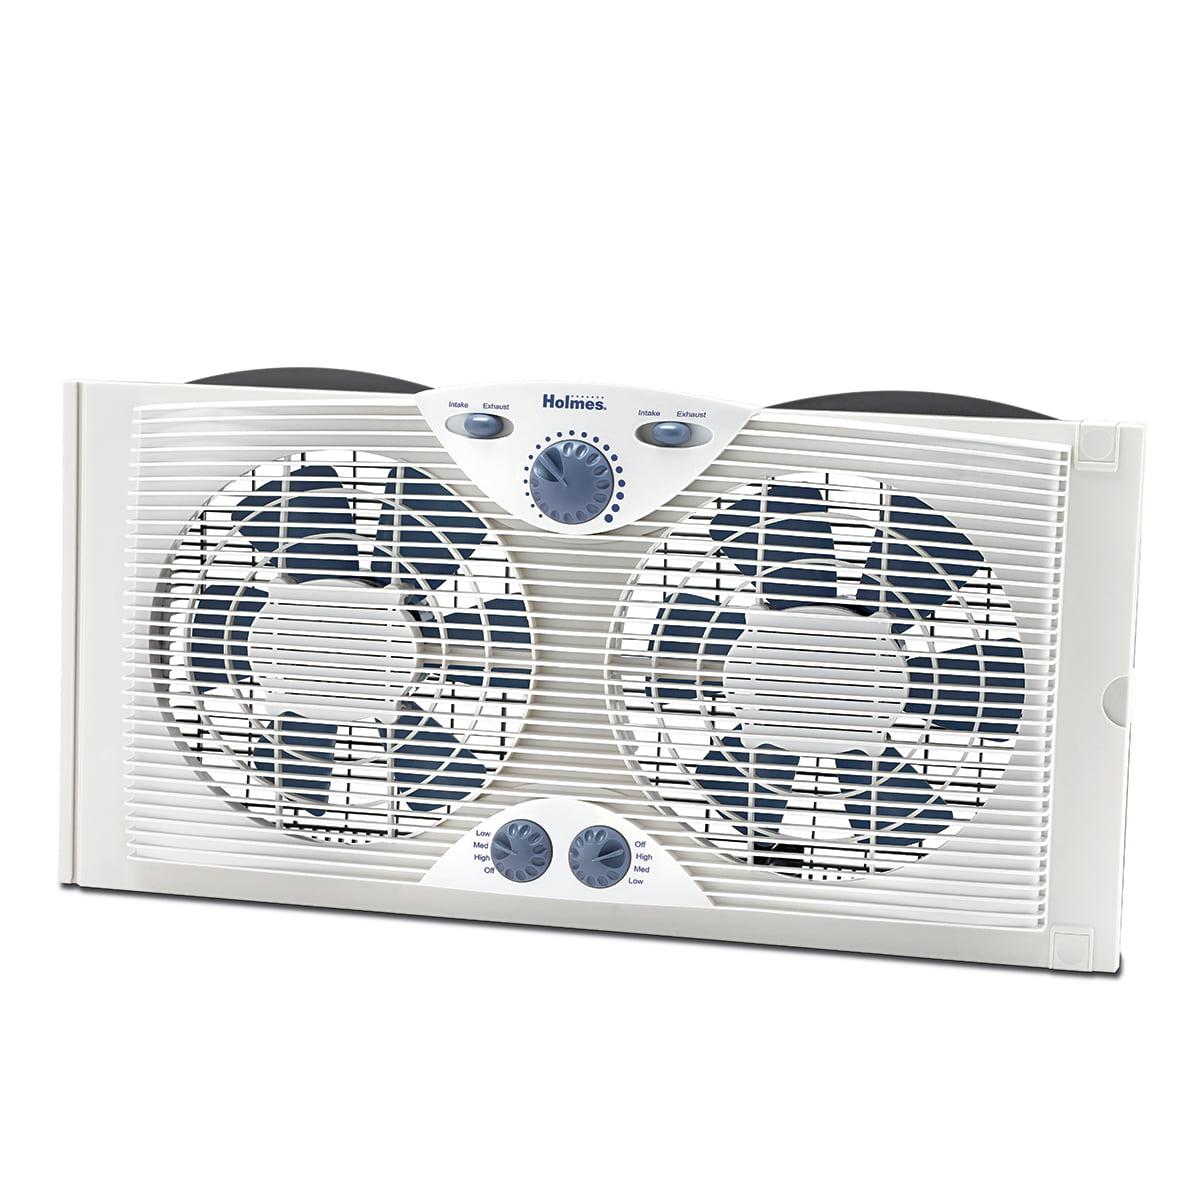 Holmes Dual Blade Window Fan with Comfort Control Thermostat (HAWF2041-N)